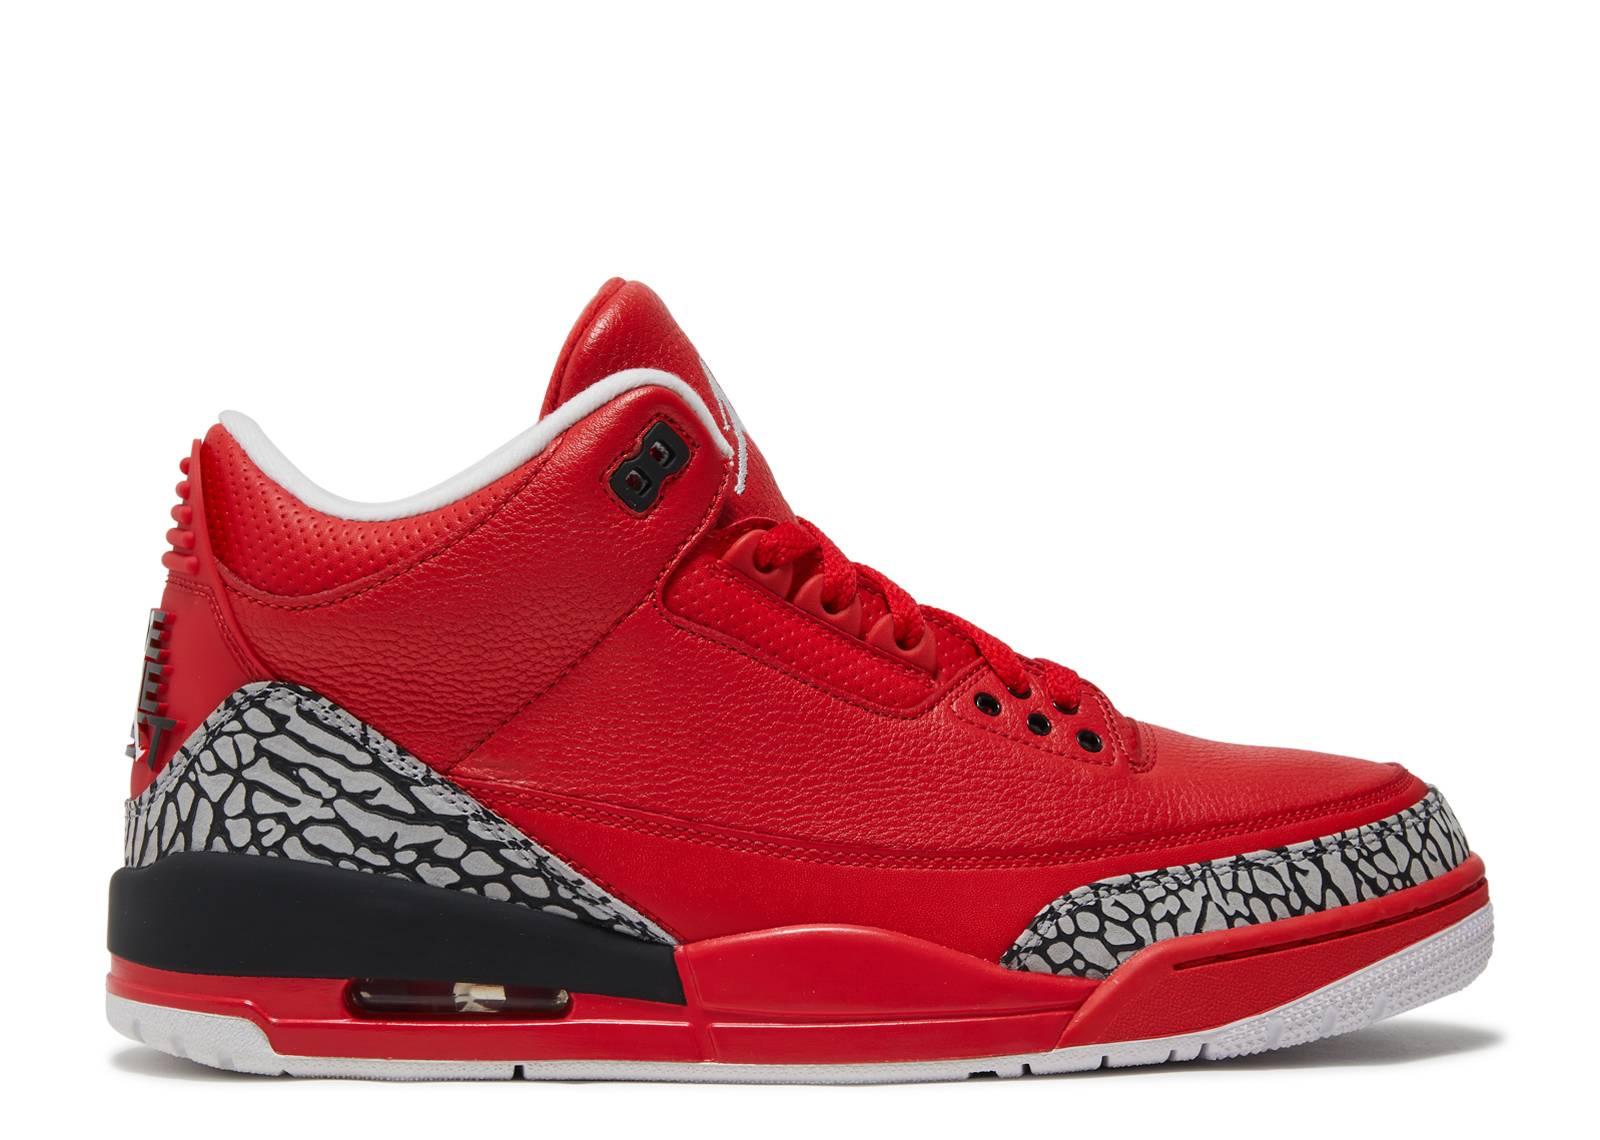 Air Jordan 13 Blanc Rouge De Ogrin